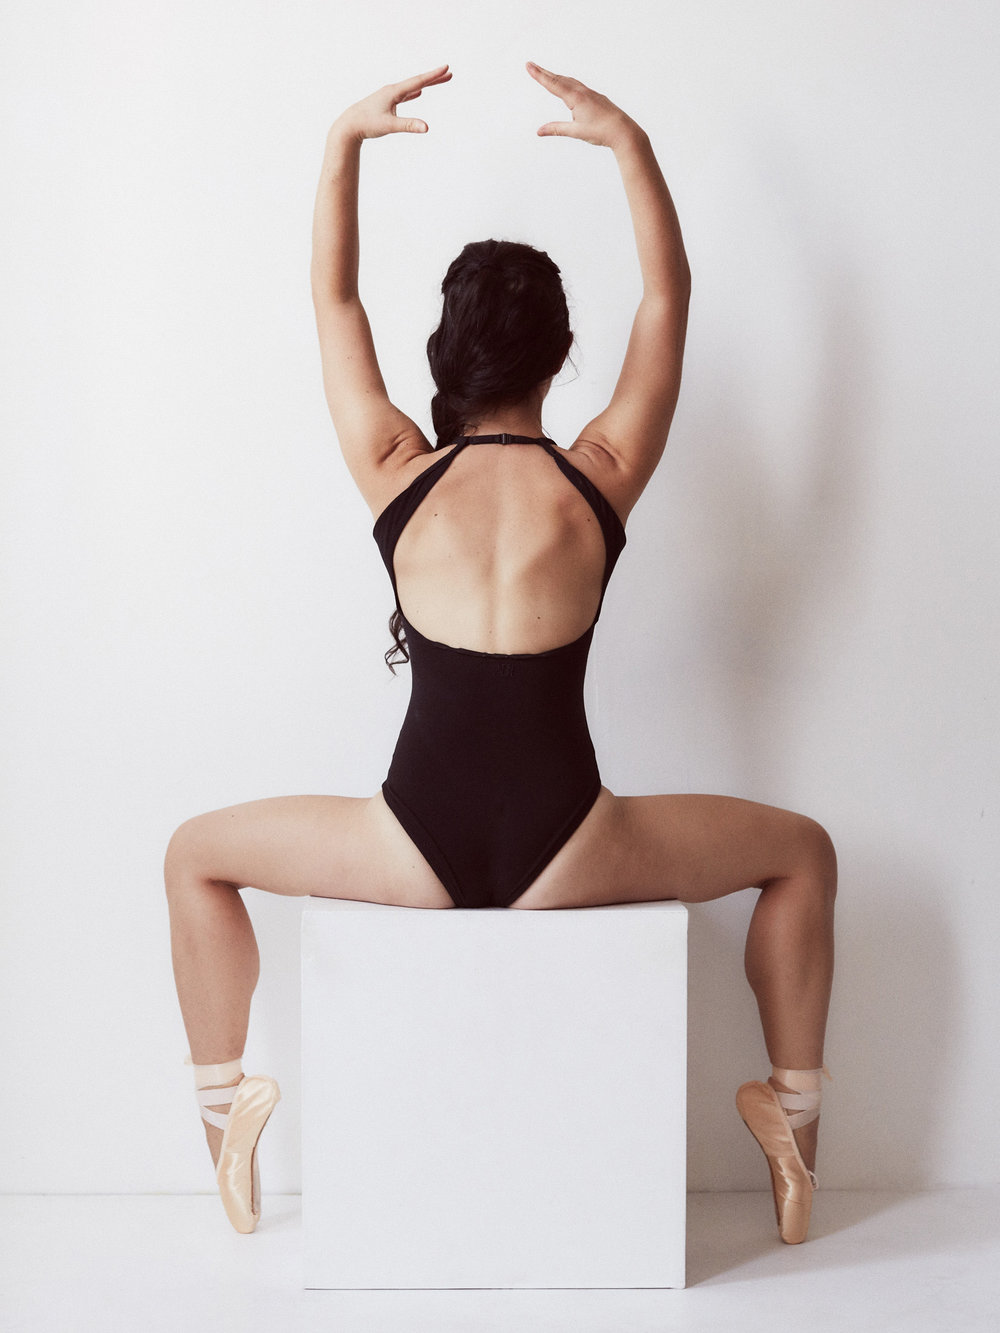 Amateur Ballerina Adult Ballerina Ballet Pointe Shoes